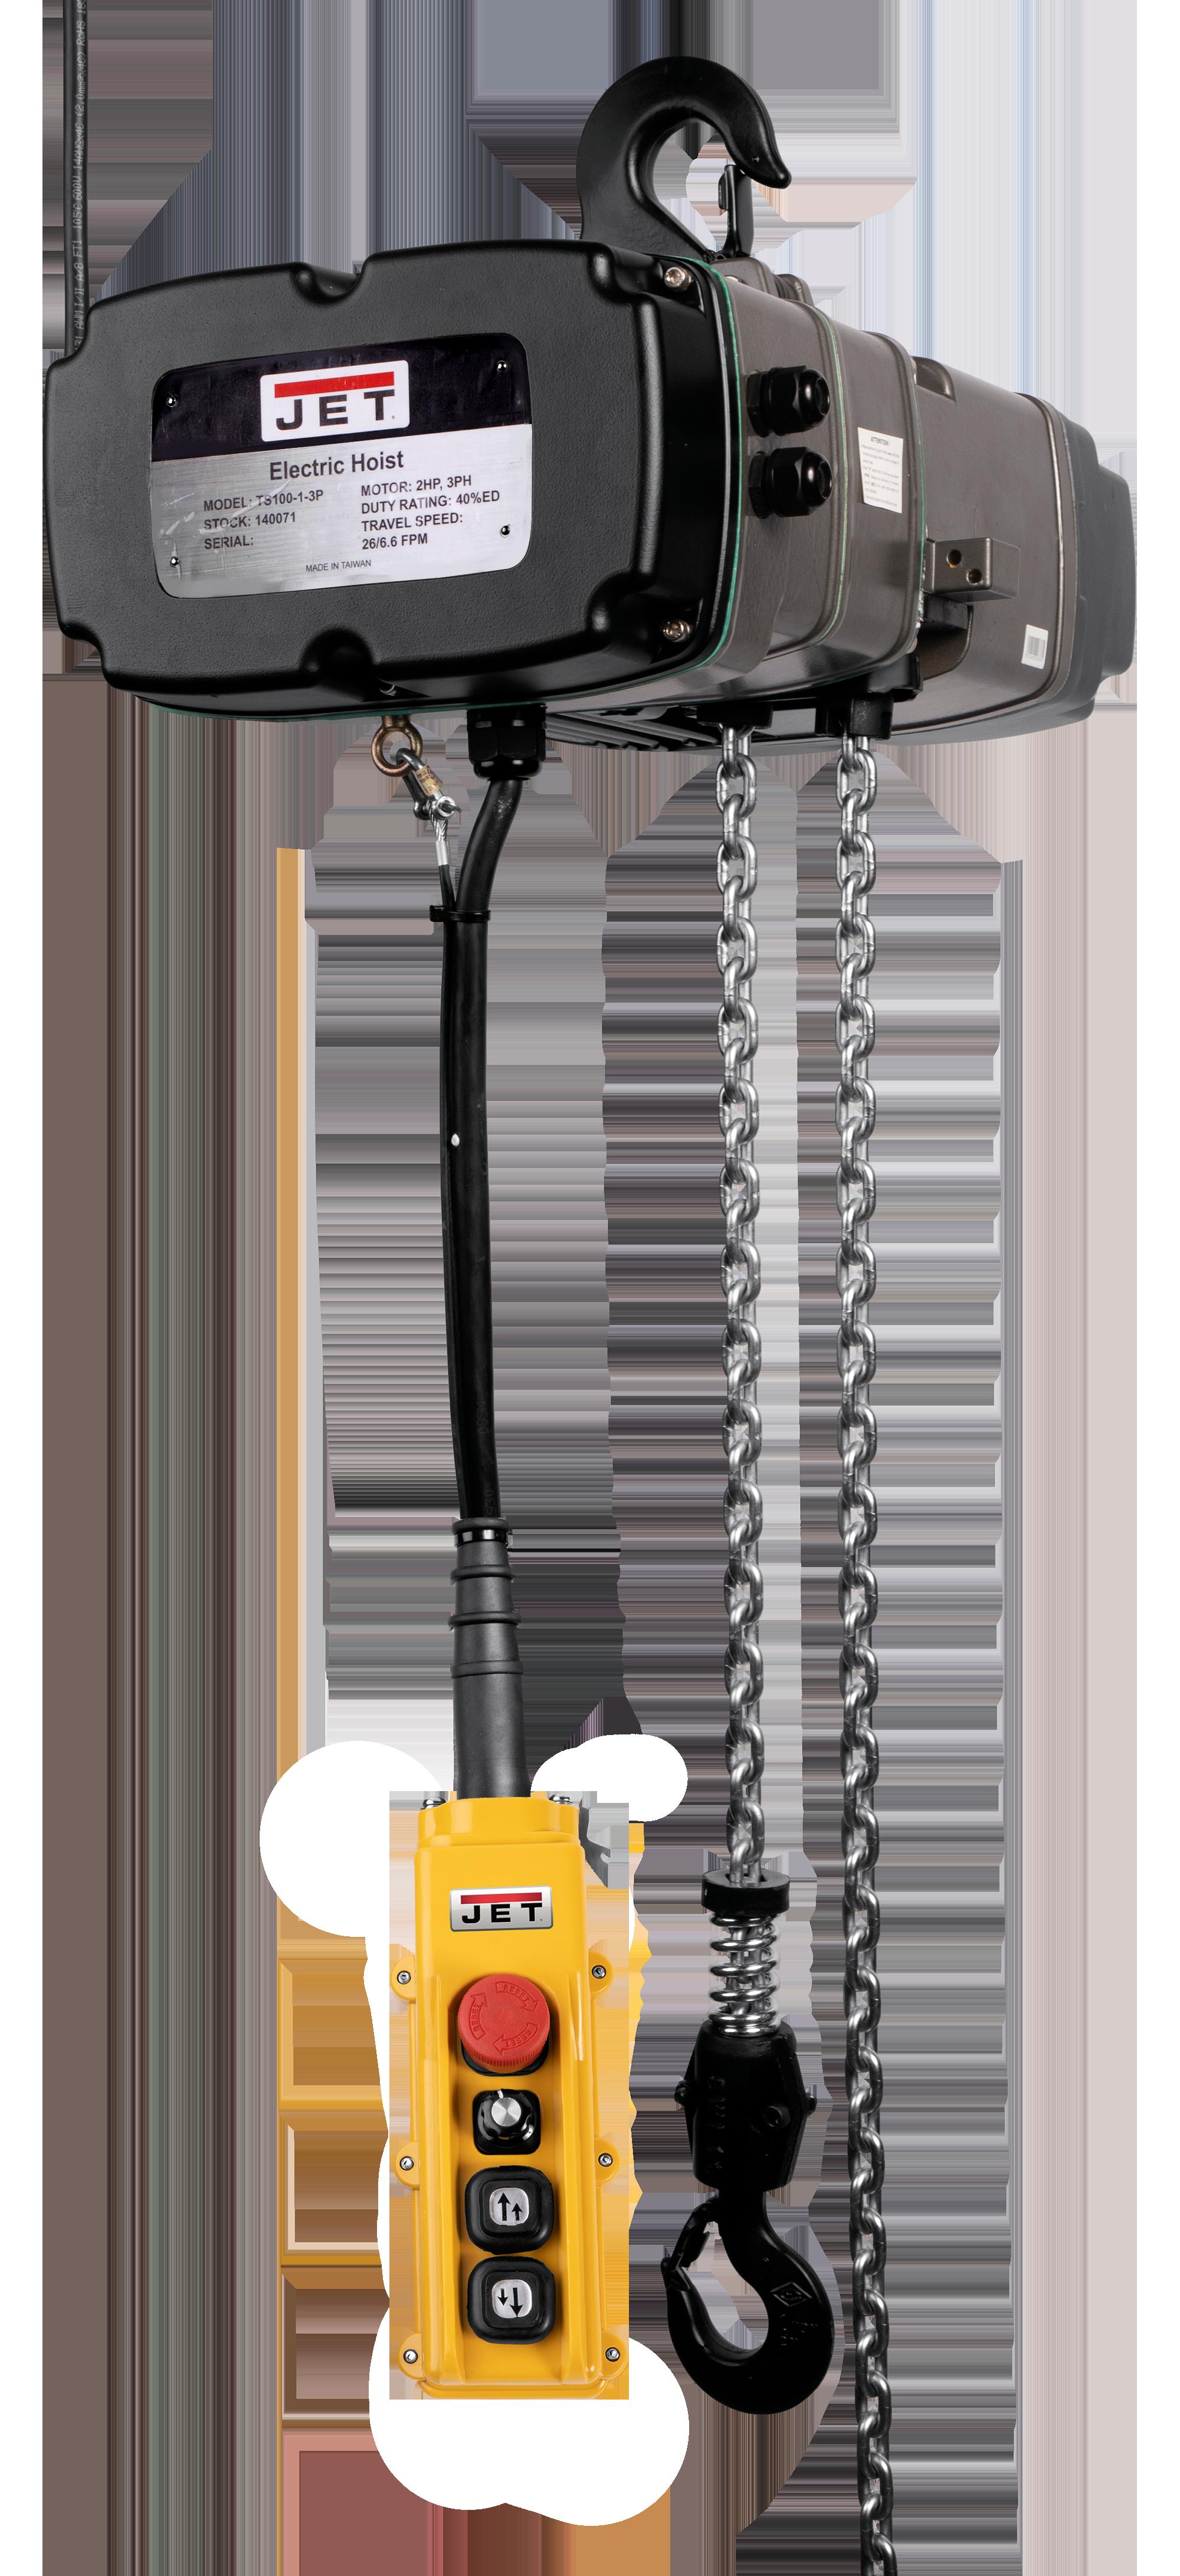 TS200-460-015, 2-Ton Two Speed Electric Chain Hoist  3-Phase 15'Llift